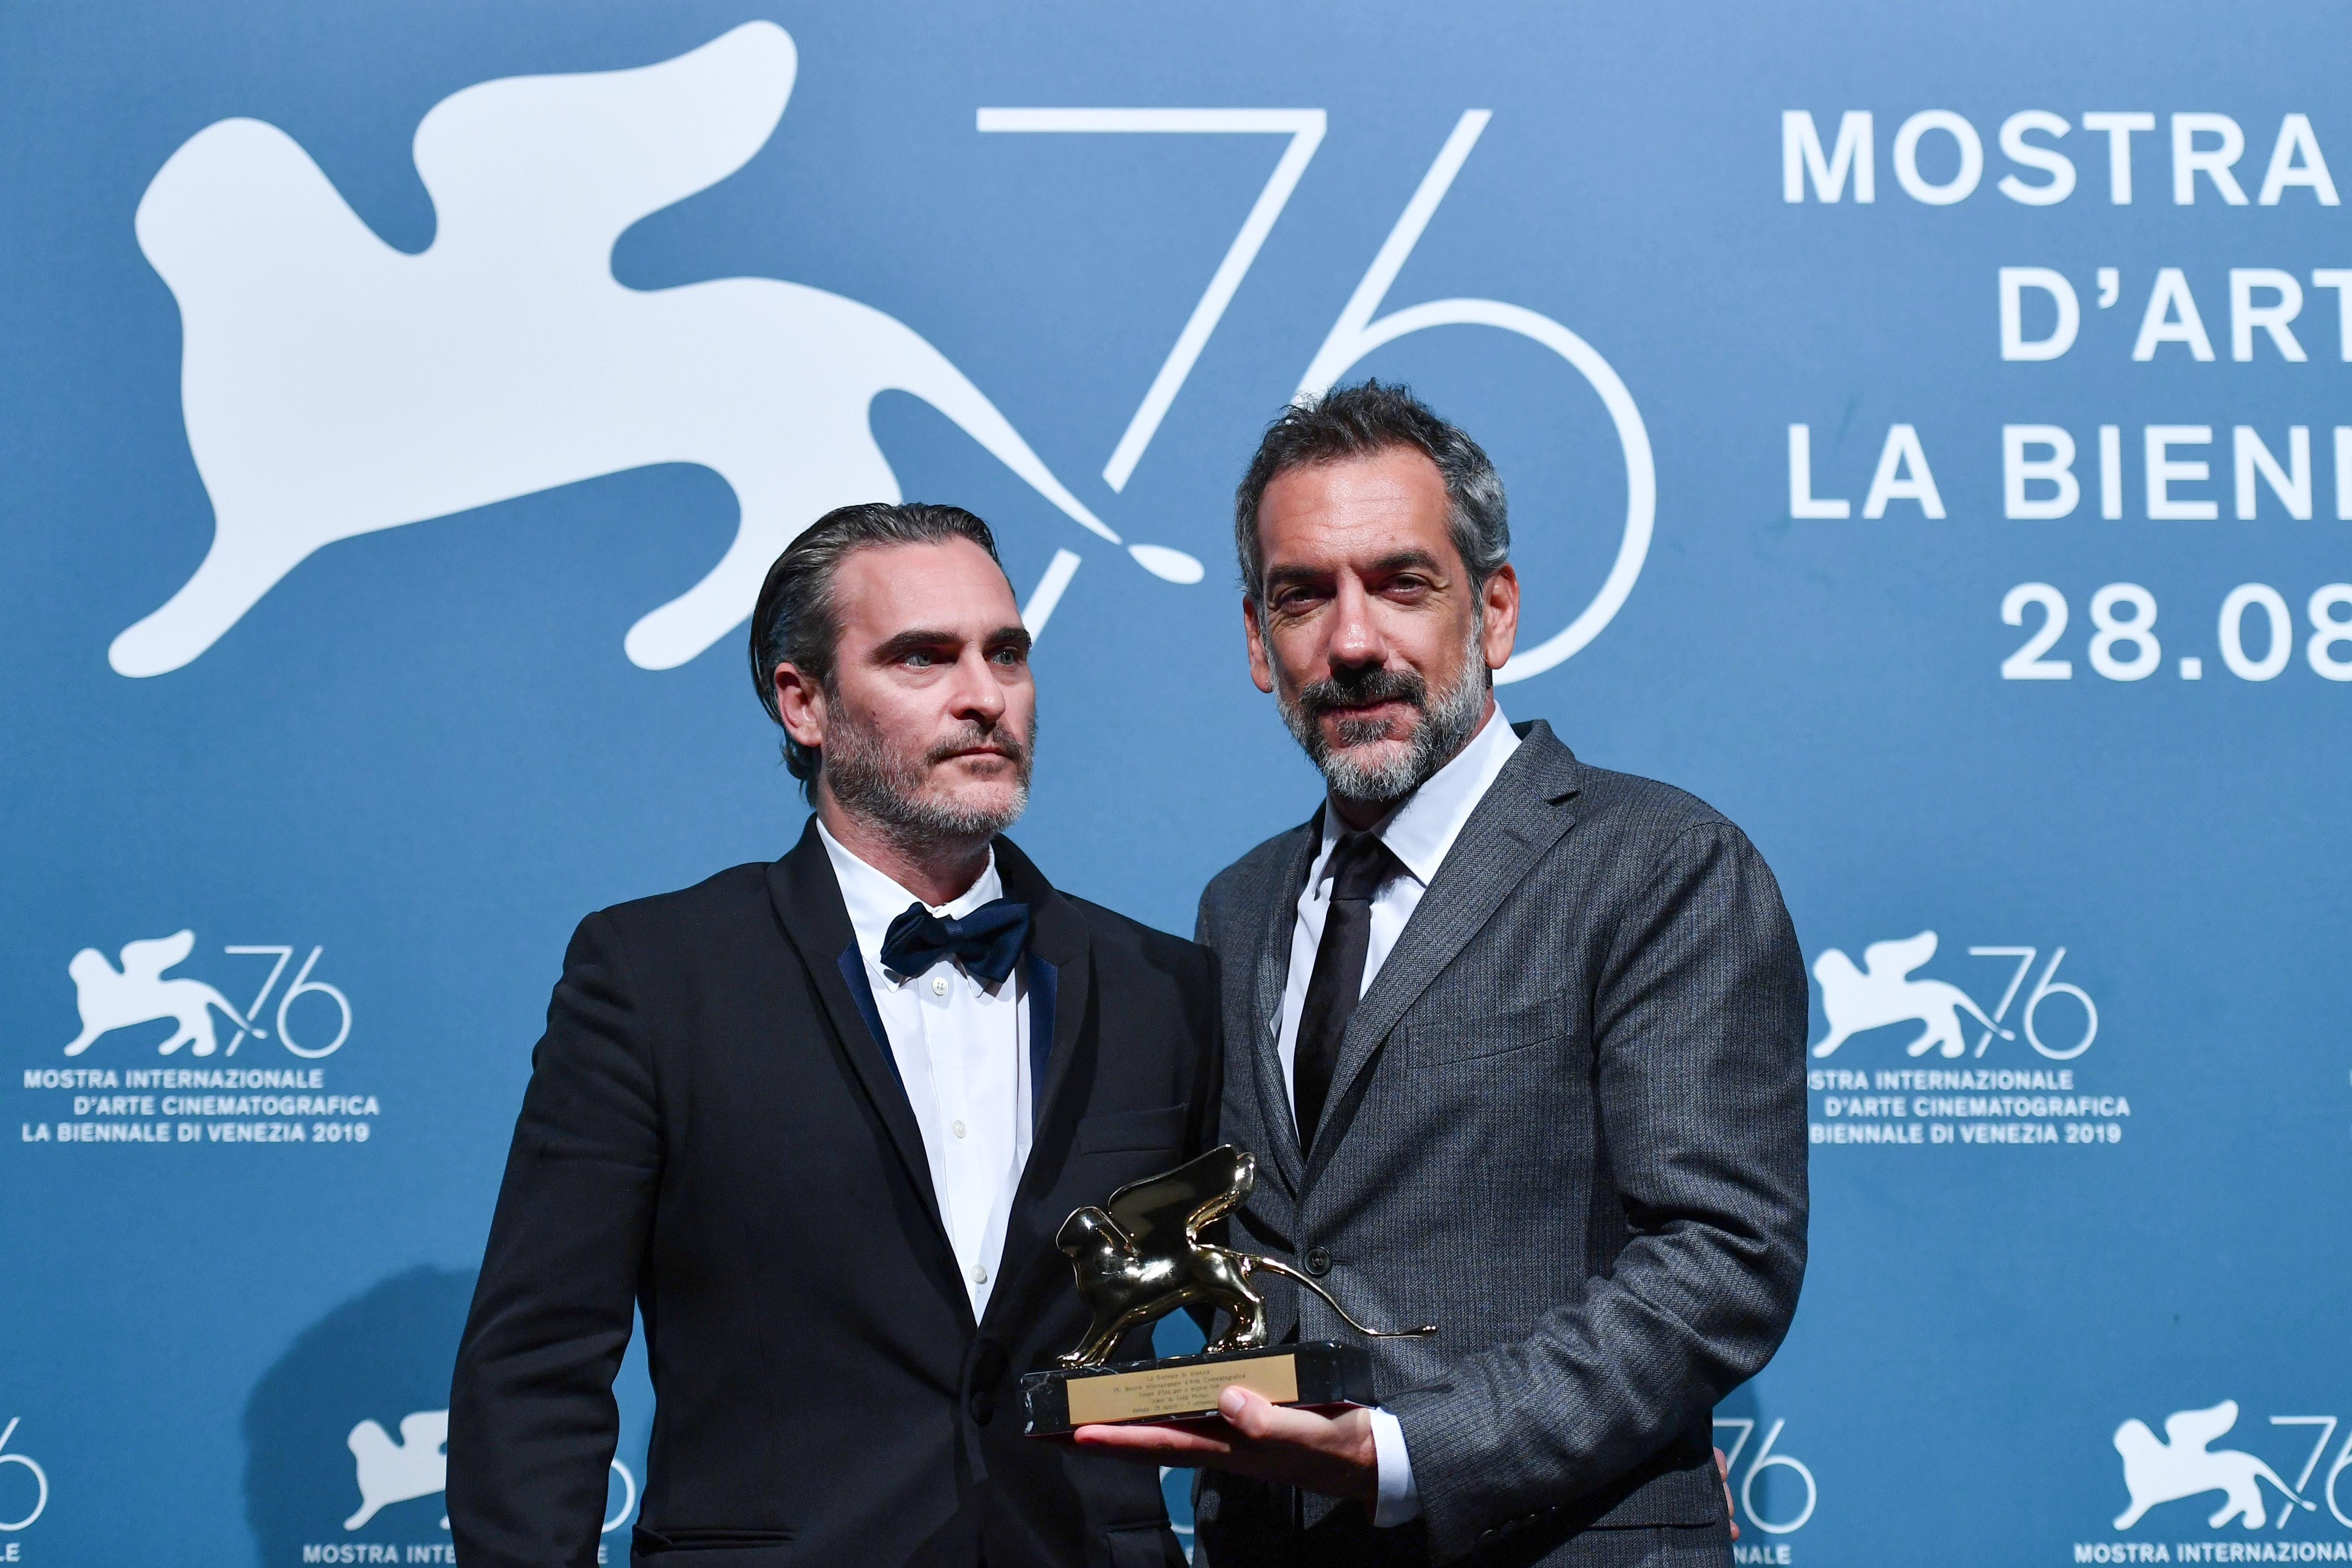 Joaquin Phoenix and Todd Phillips, Joker, 2019, winner Venice